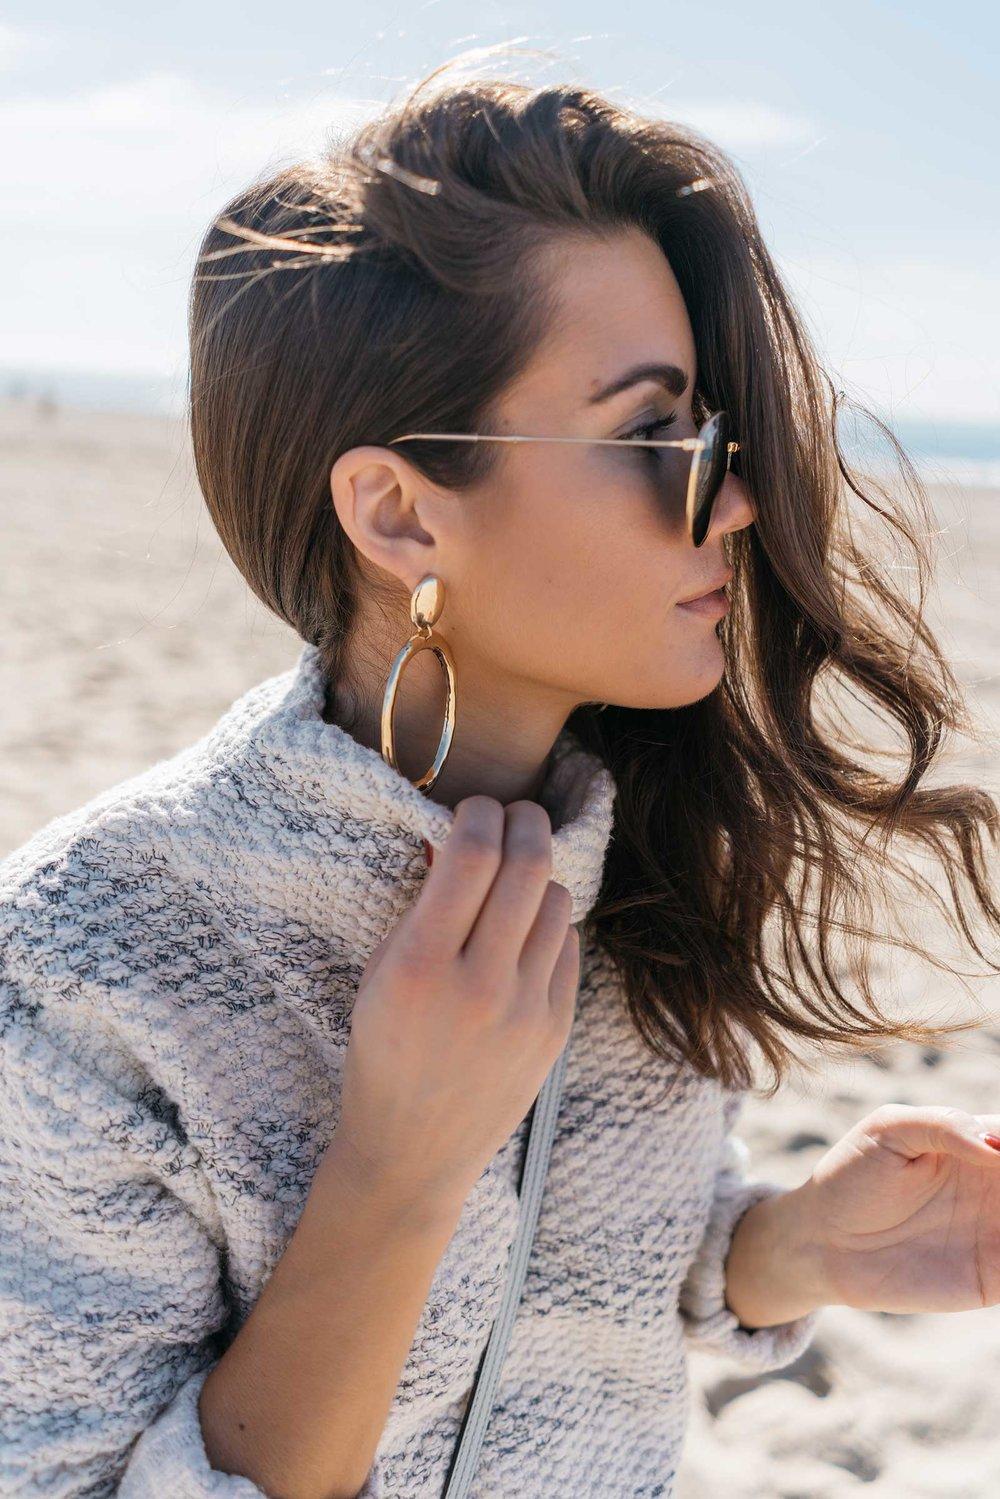 O'Neill-Livie-Striped-Mock-Neck-Sweater-Chloe-Faye-Small-Leather-Bracelet-Bag-Ray-Ban-53mm-Retro-Sunglasses-8.jpg